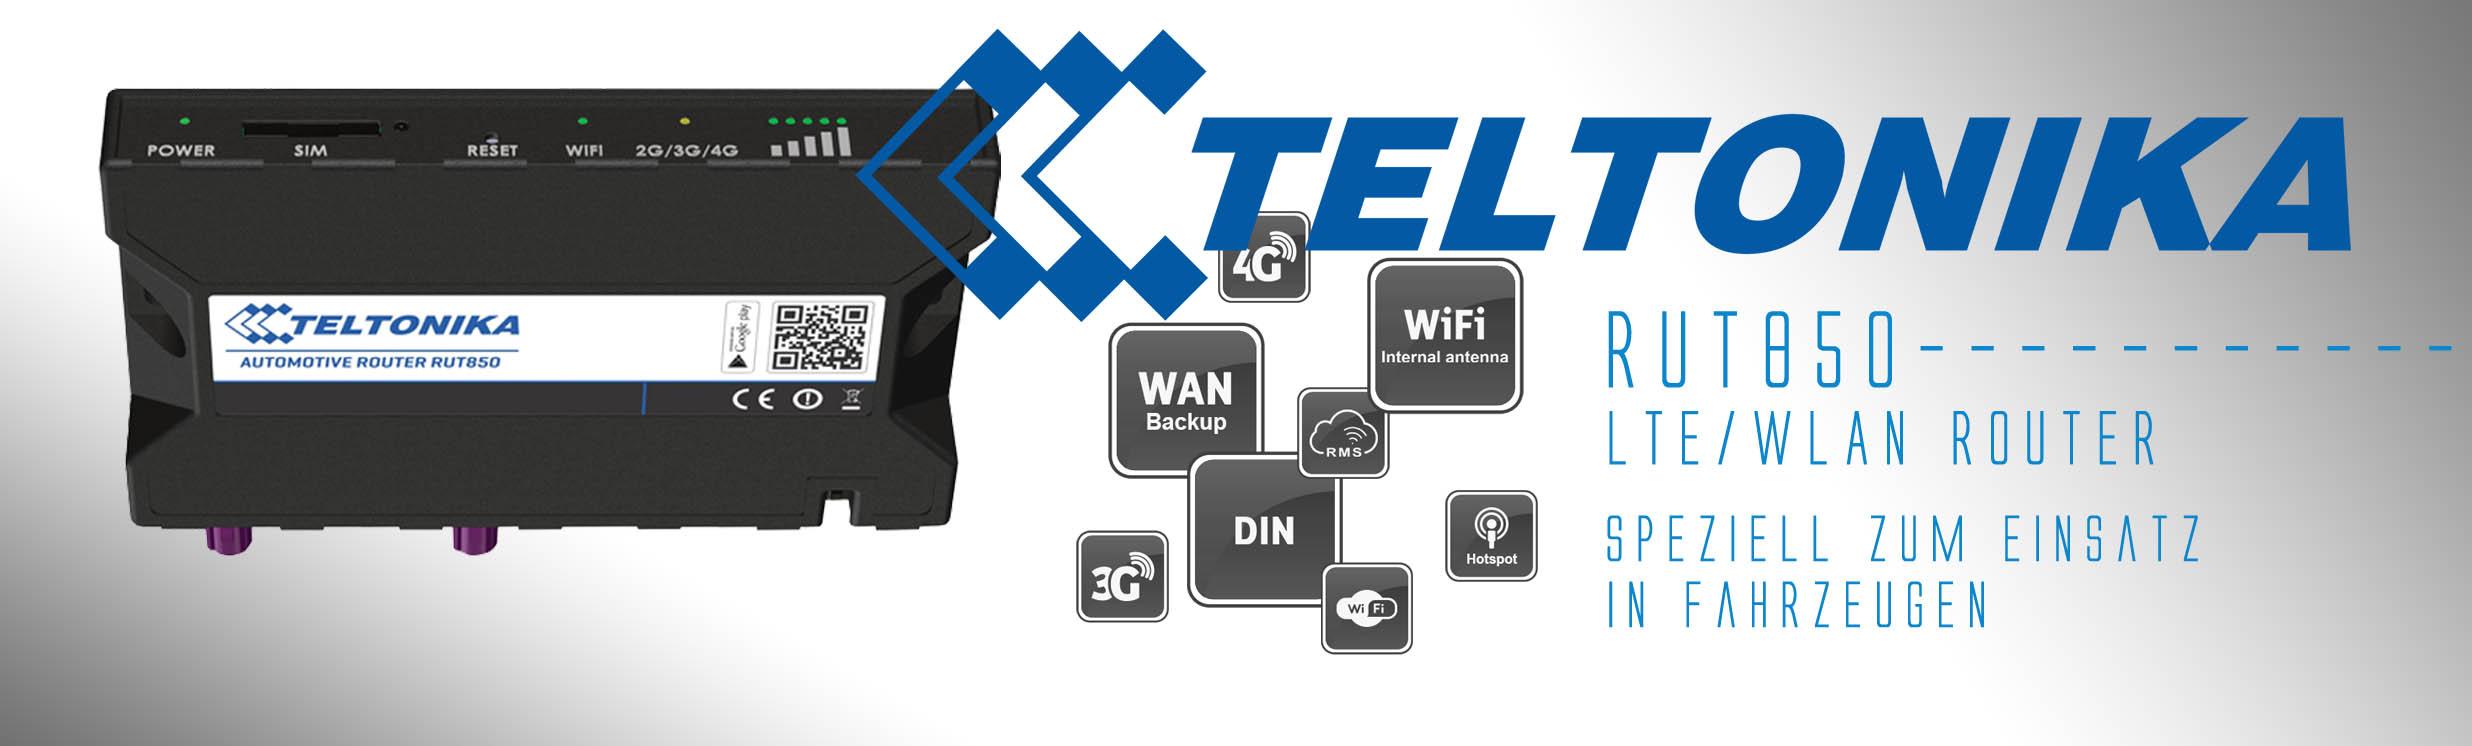 TELTONIKA RUT850 LTE / 4G Automotive Router